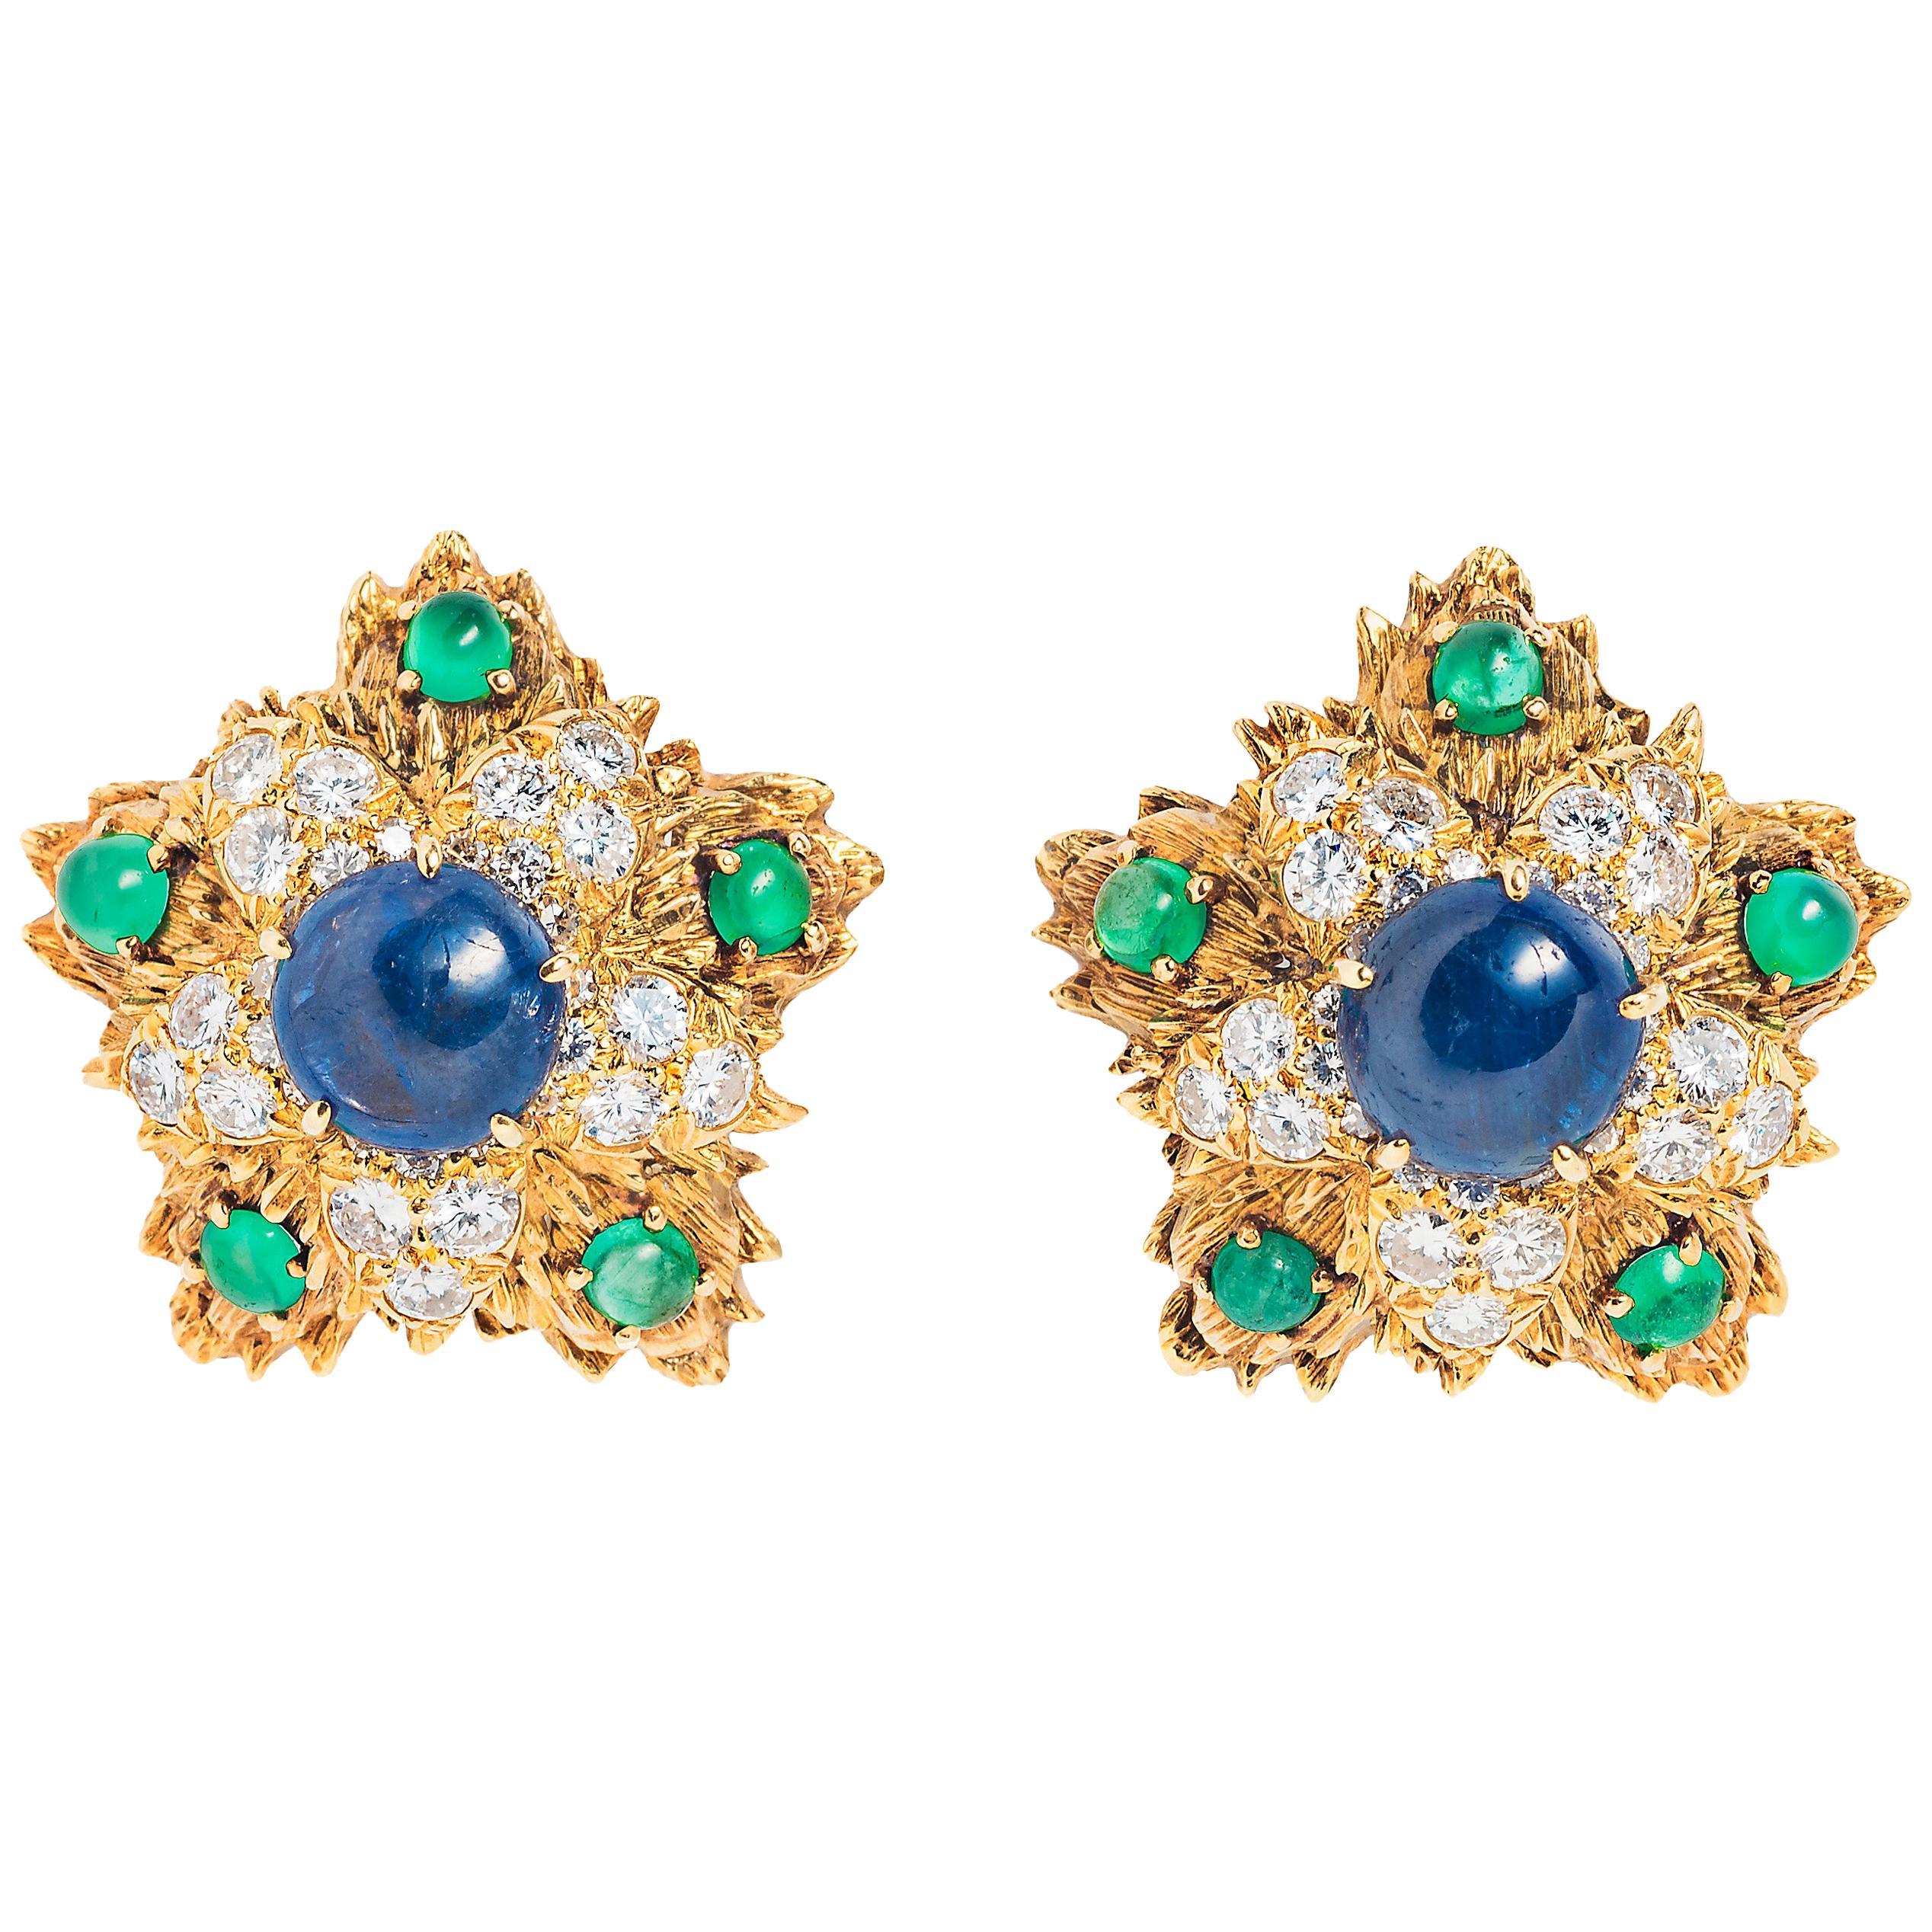 David Webb Sapphire Emerald, Diamond and Gold Ear Clips